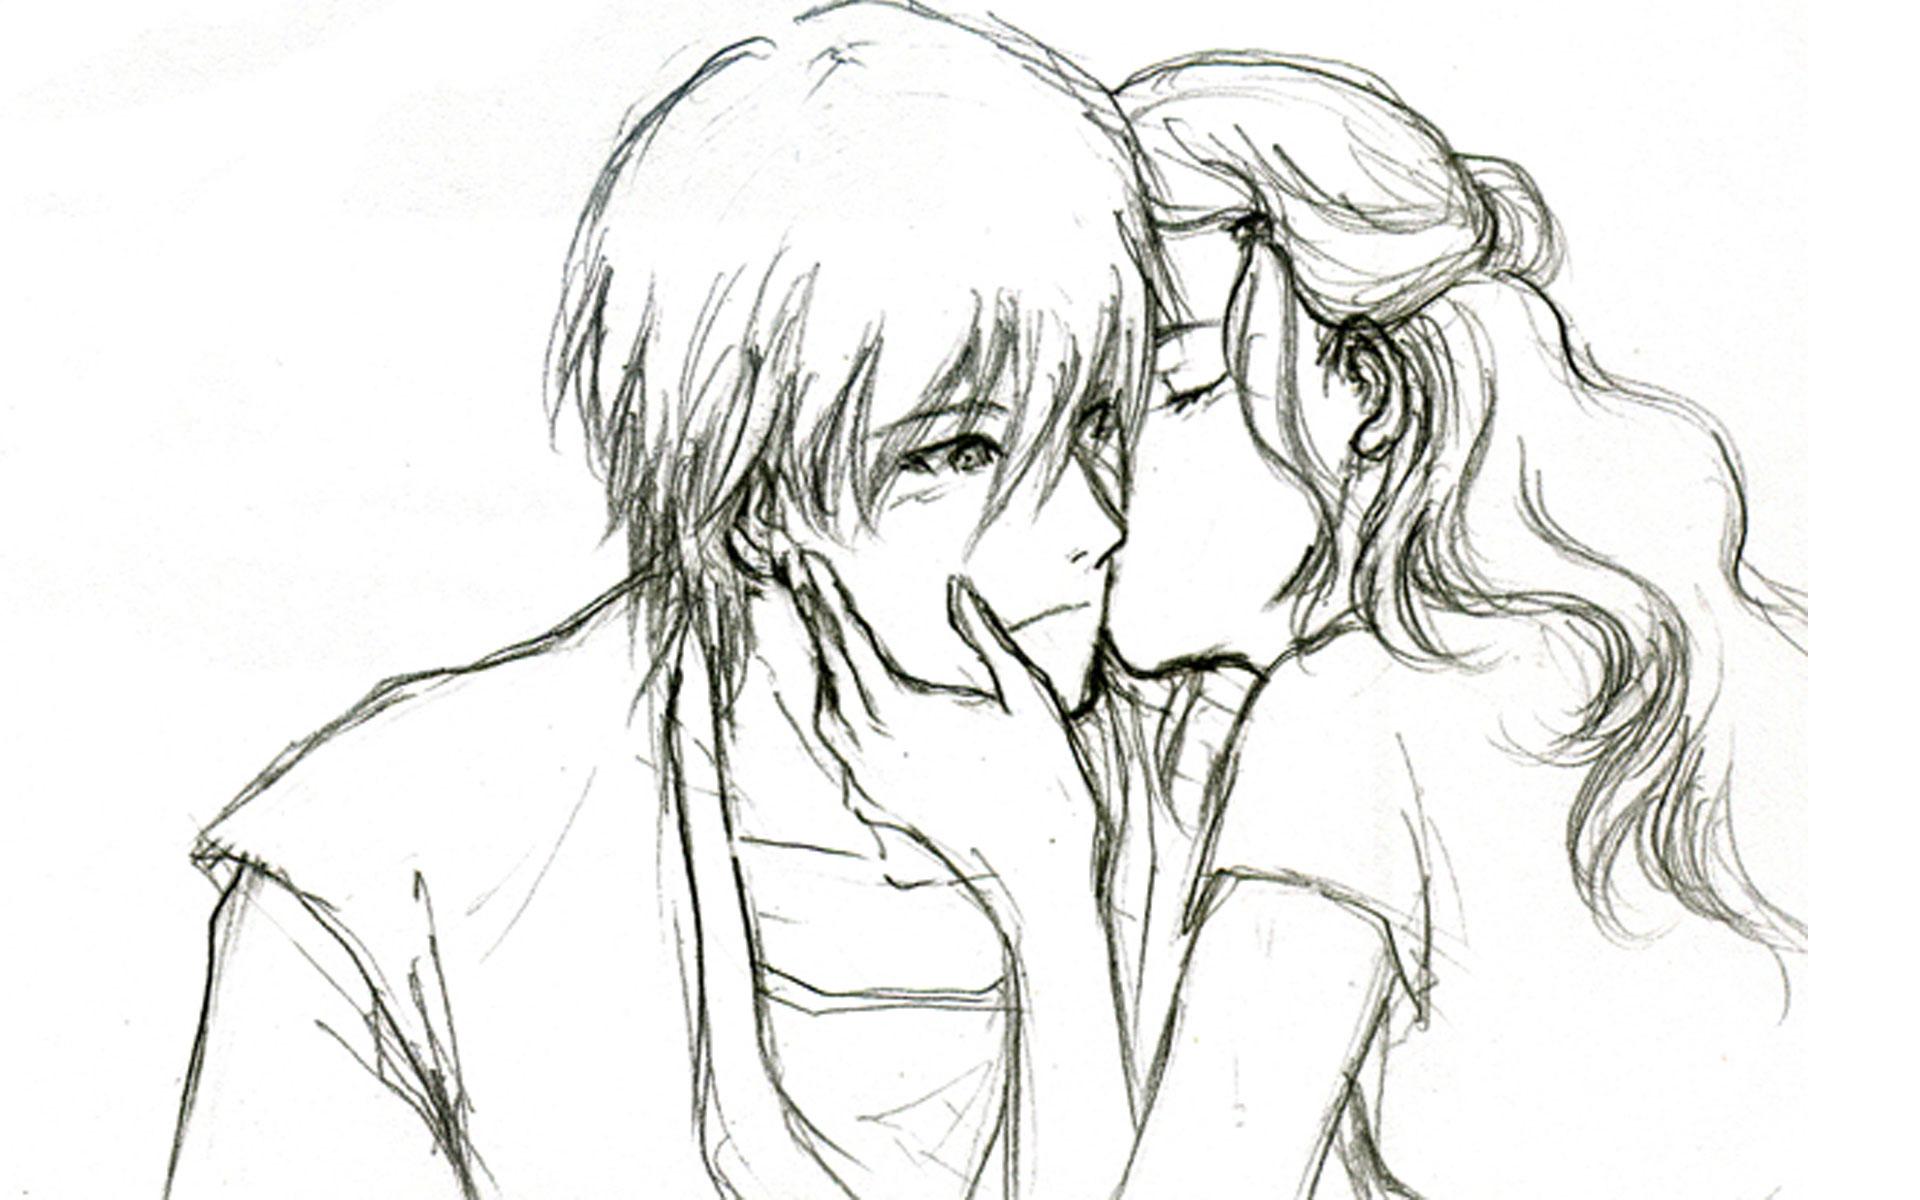 1920x1200 Simple Romantic Pencil Drawings Easy Pencil Drawings Of Love